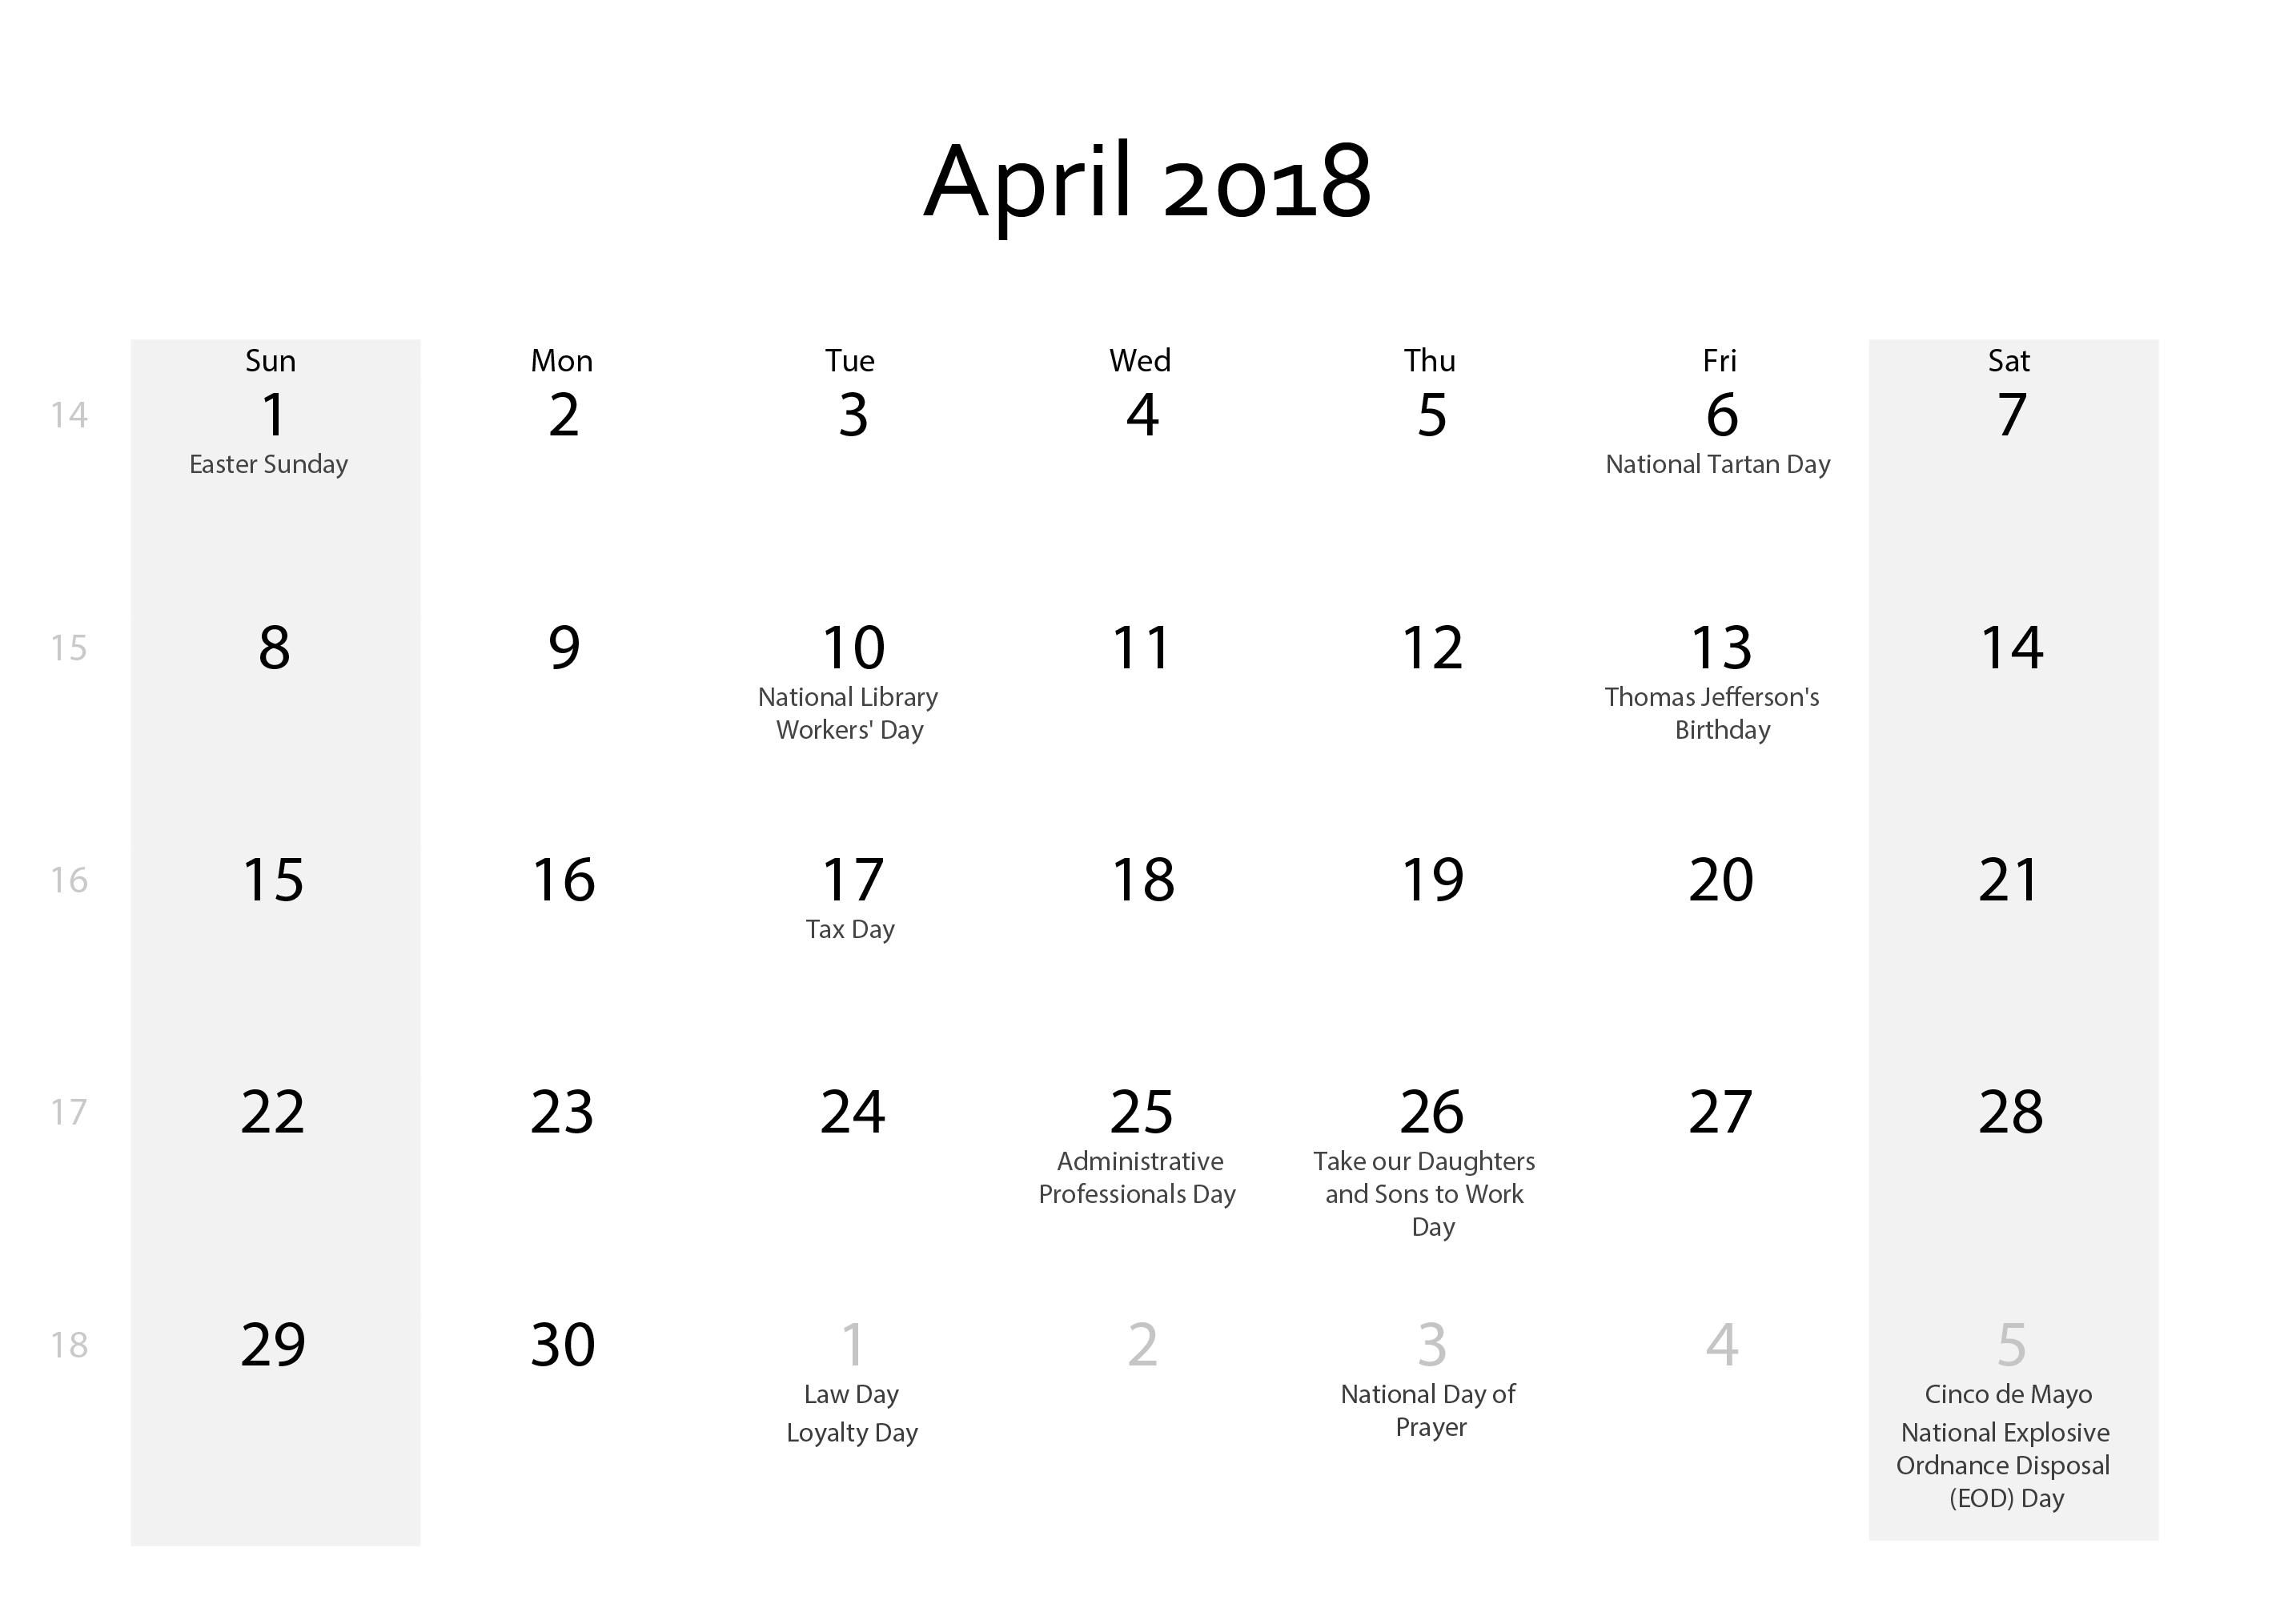 April 2018 Calendar Vertical Free Download April 2018 Calendar With  Holidays Download - Calendar April PNG